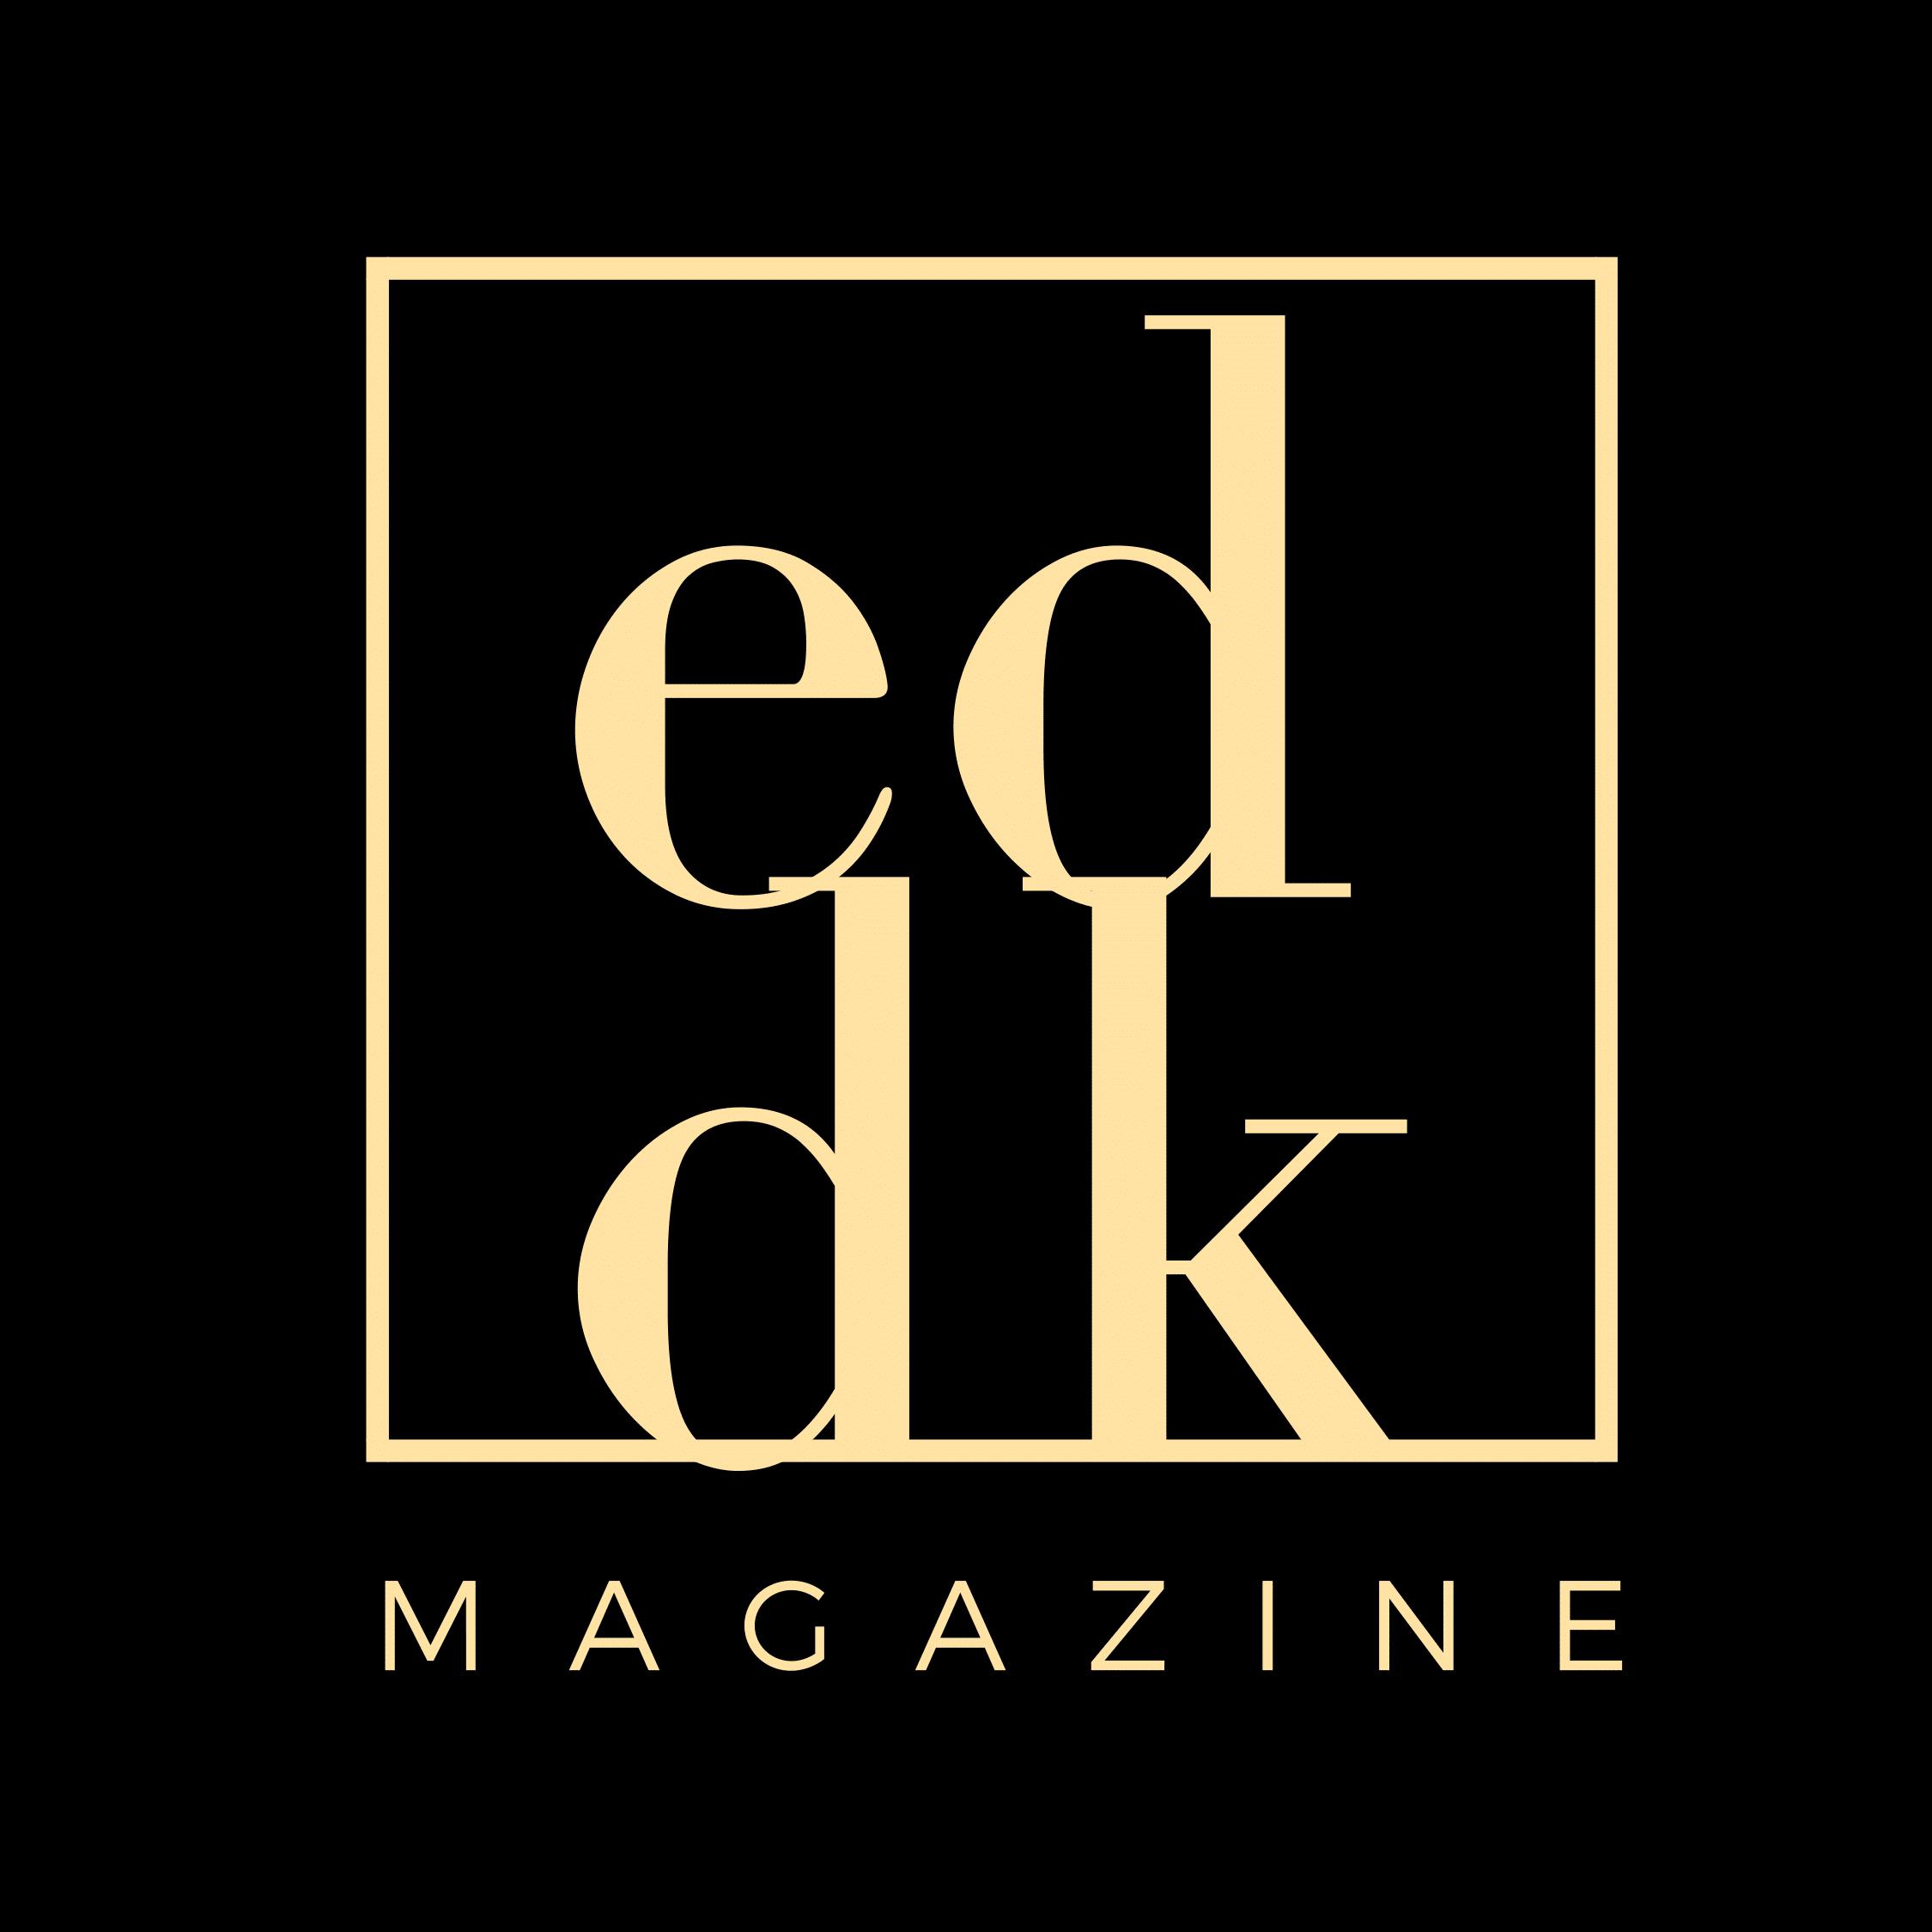 EDDK Magazine